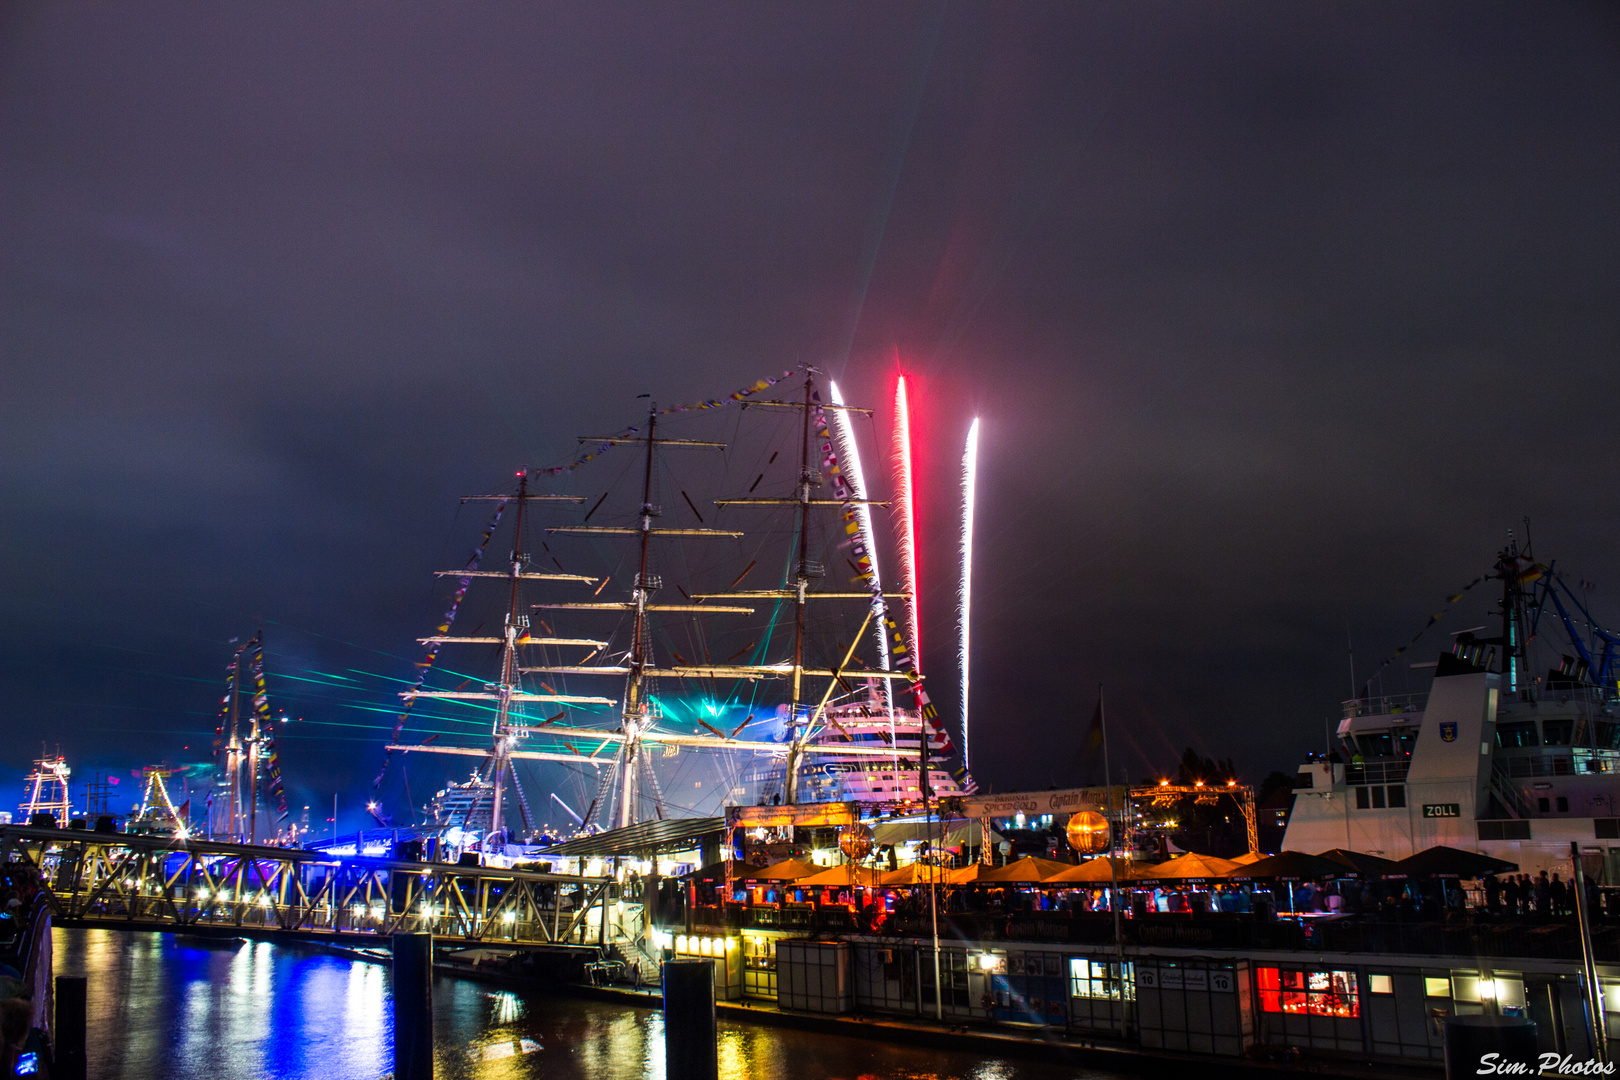 825. Hafengeburtstag Hamburg (AIDA Stella - AIDA Sol) (Feuerwerk)